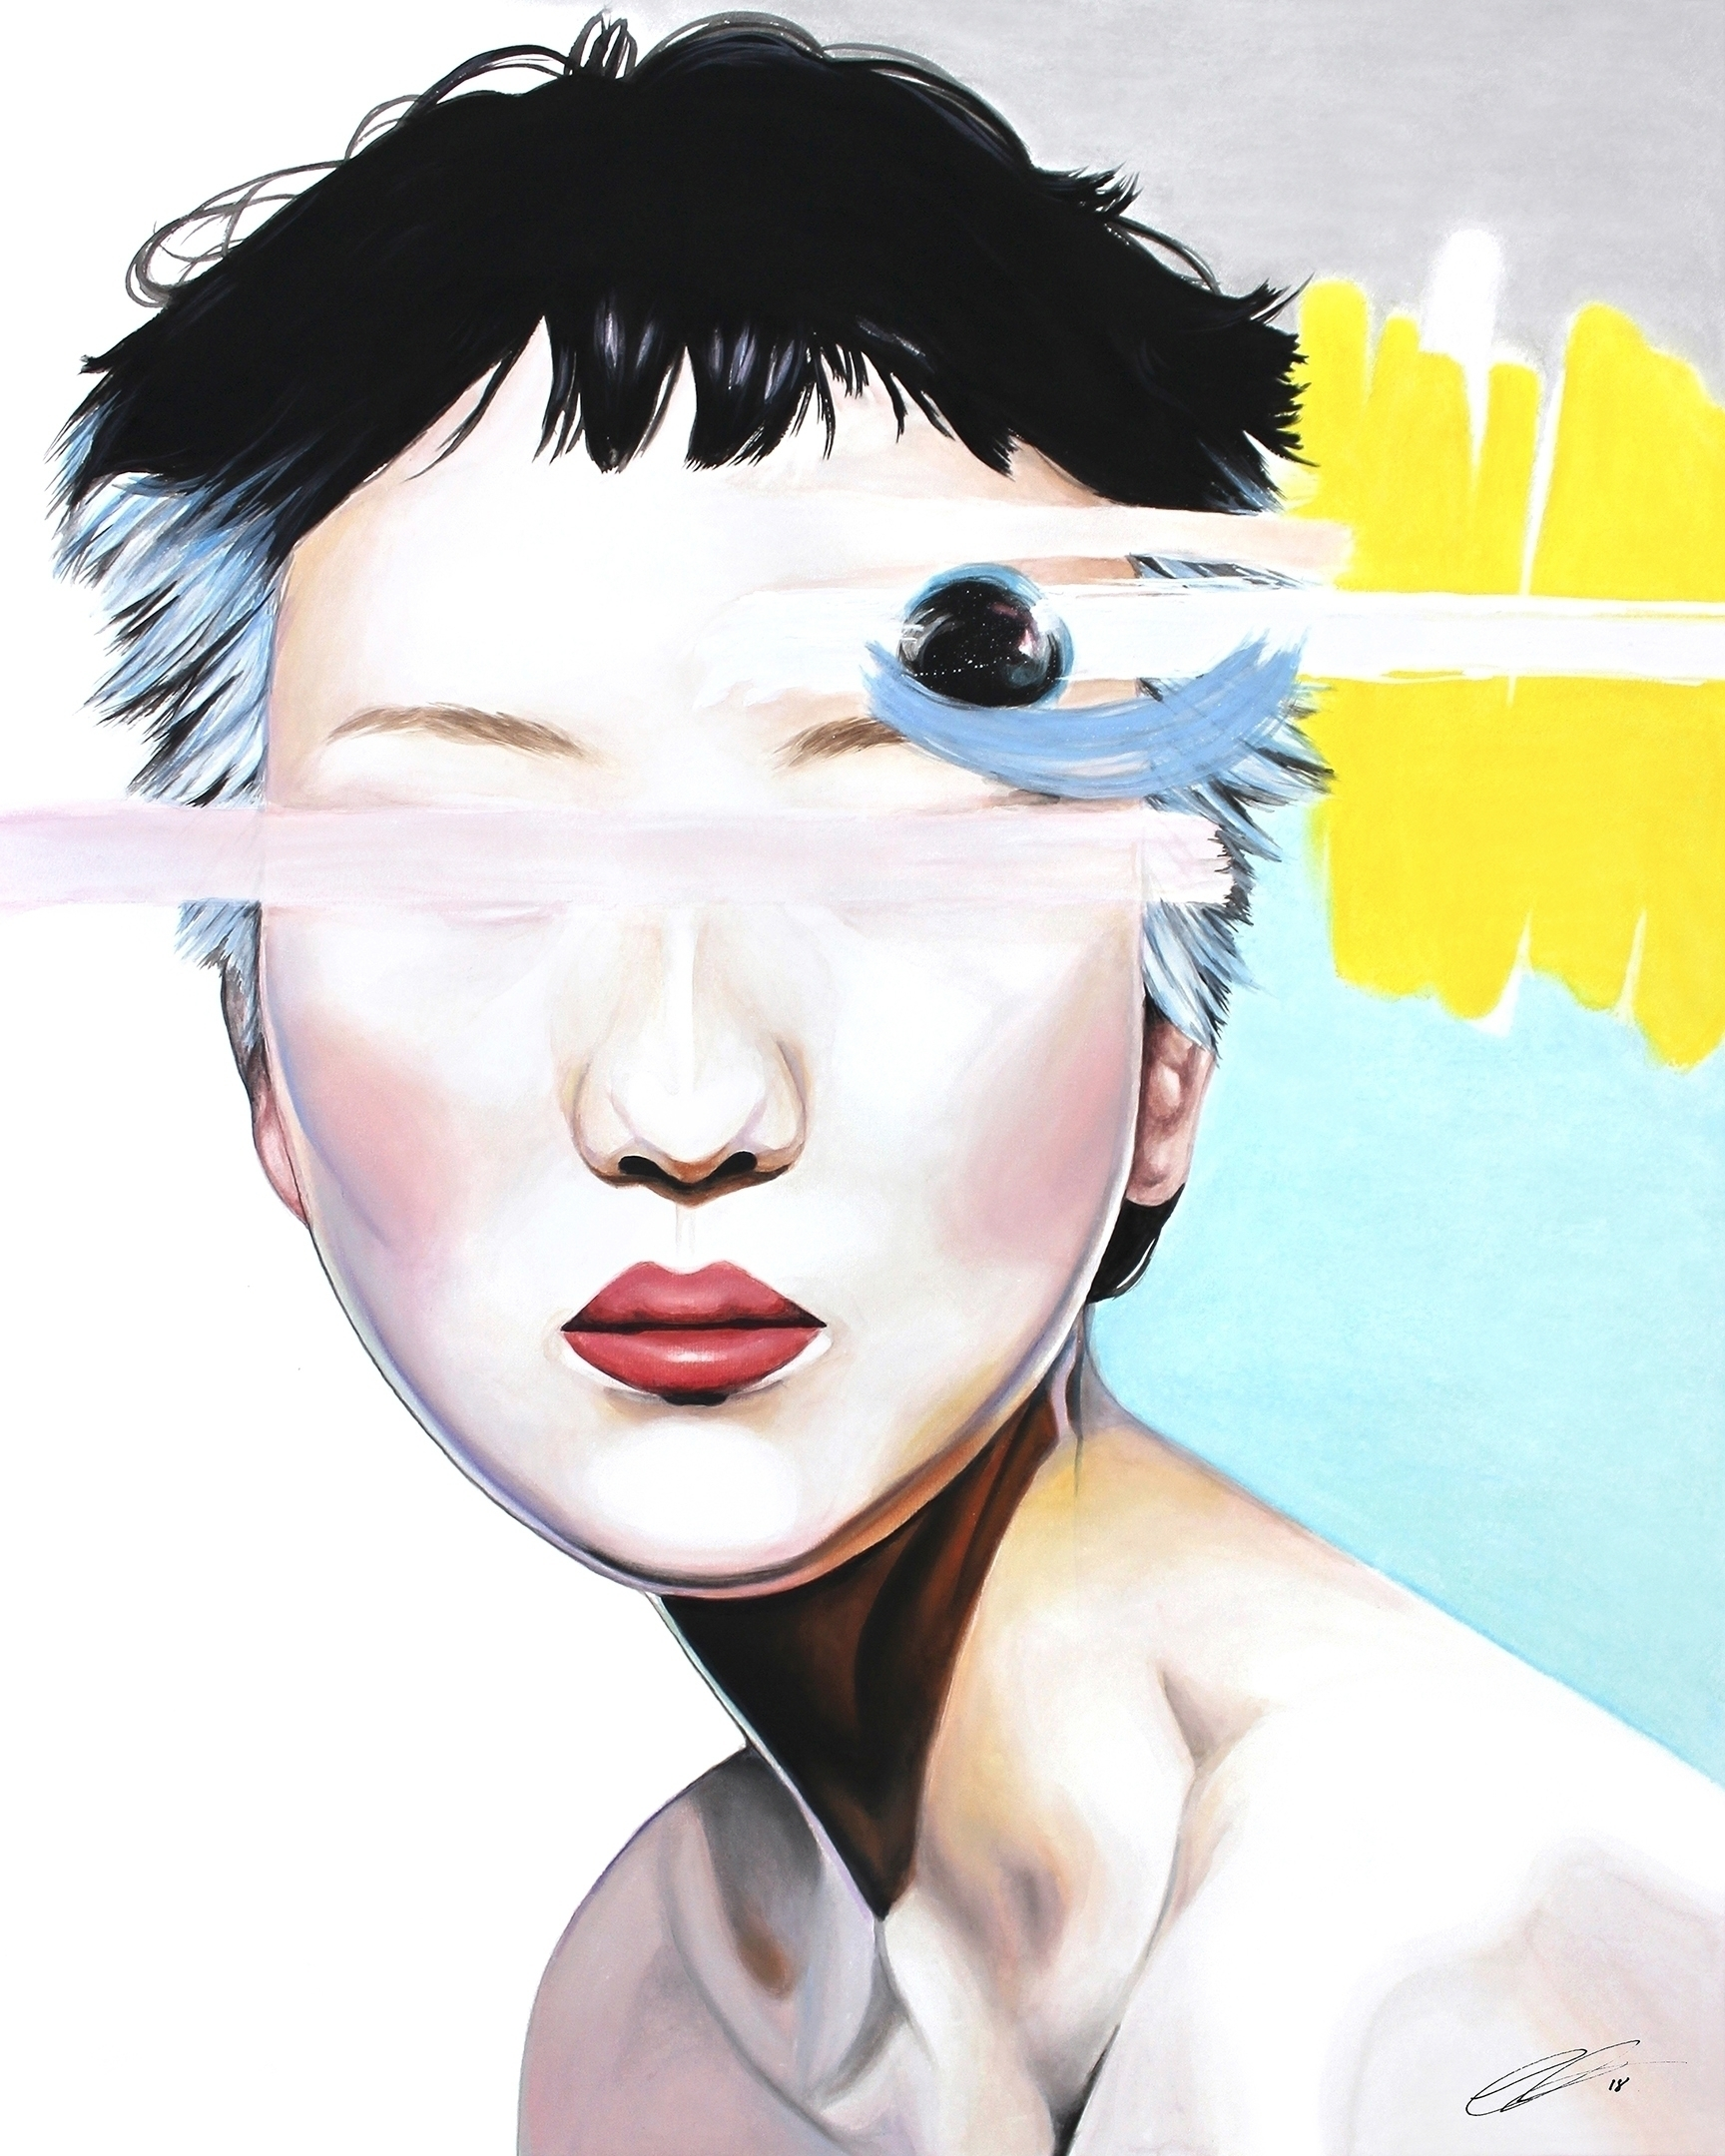 ABERRANT BEHAVIOR Watercolor, p - defectivebarbie | ello